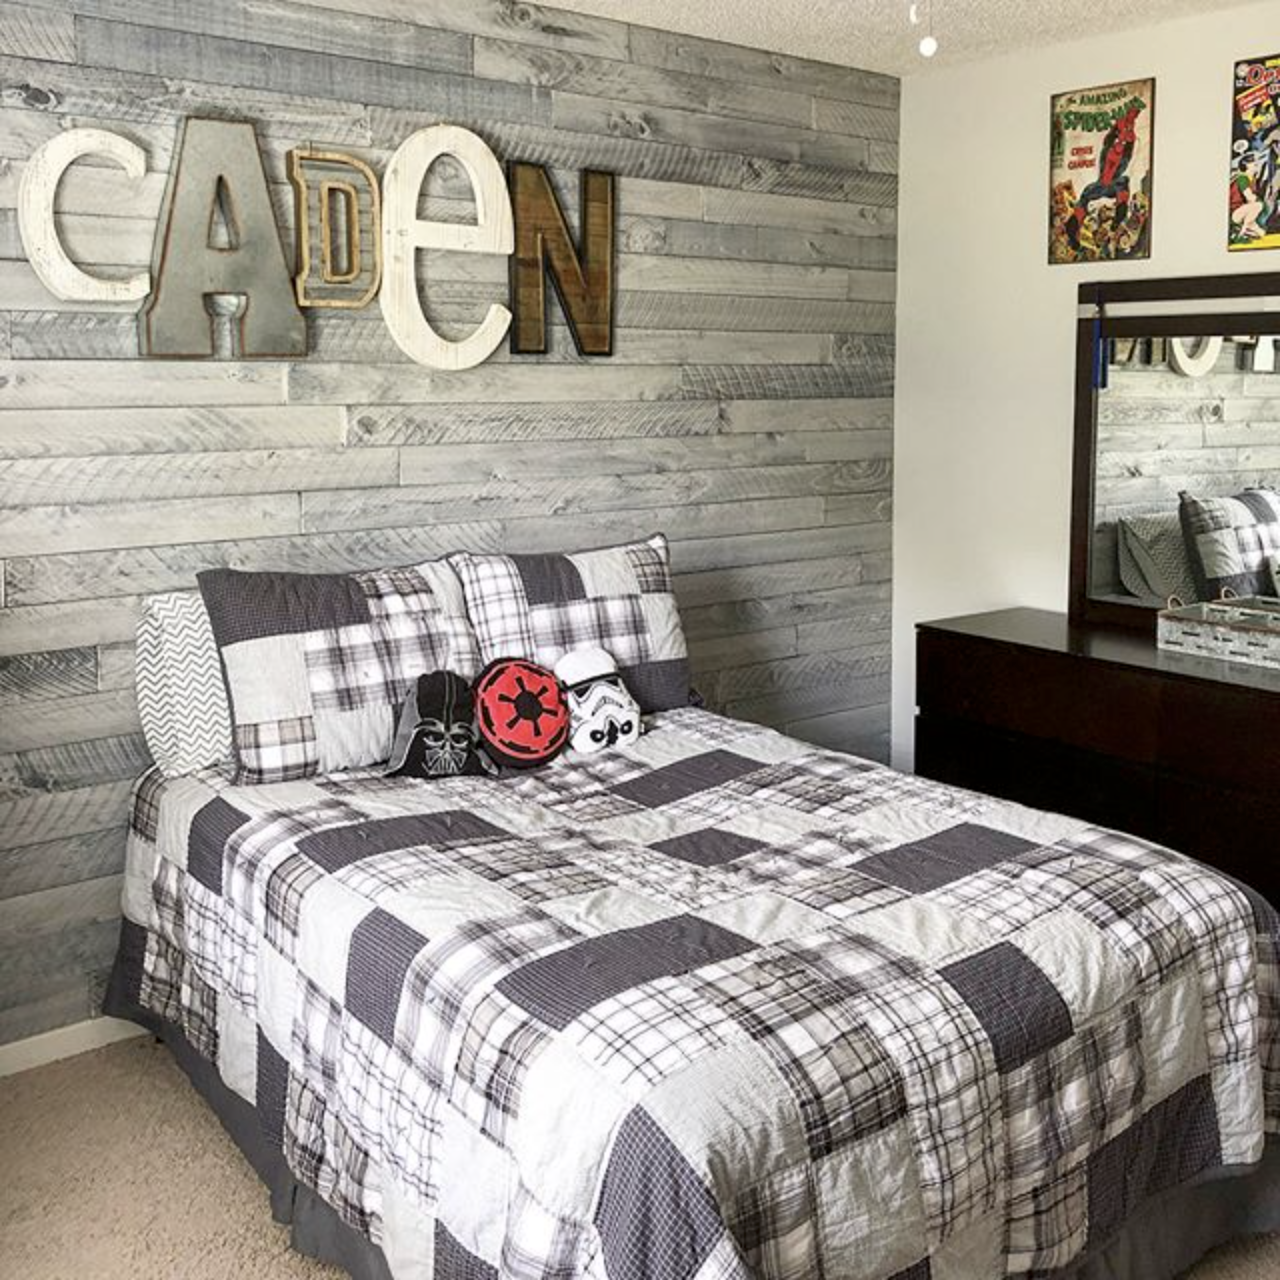 Nantucket Bedroom Design Ideas: Nantucket Gray Wall Boards Accent Wall In Boy's Bedroom By